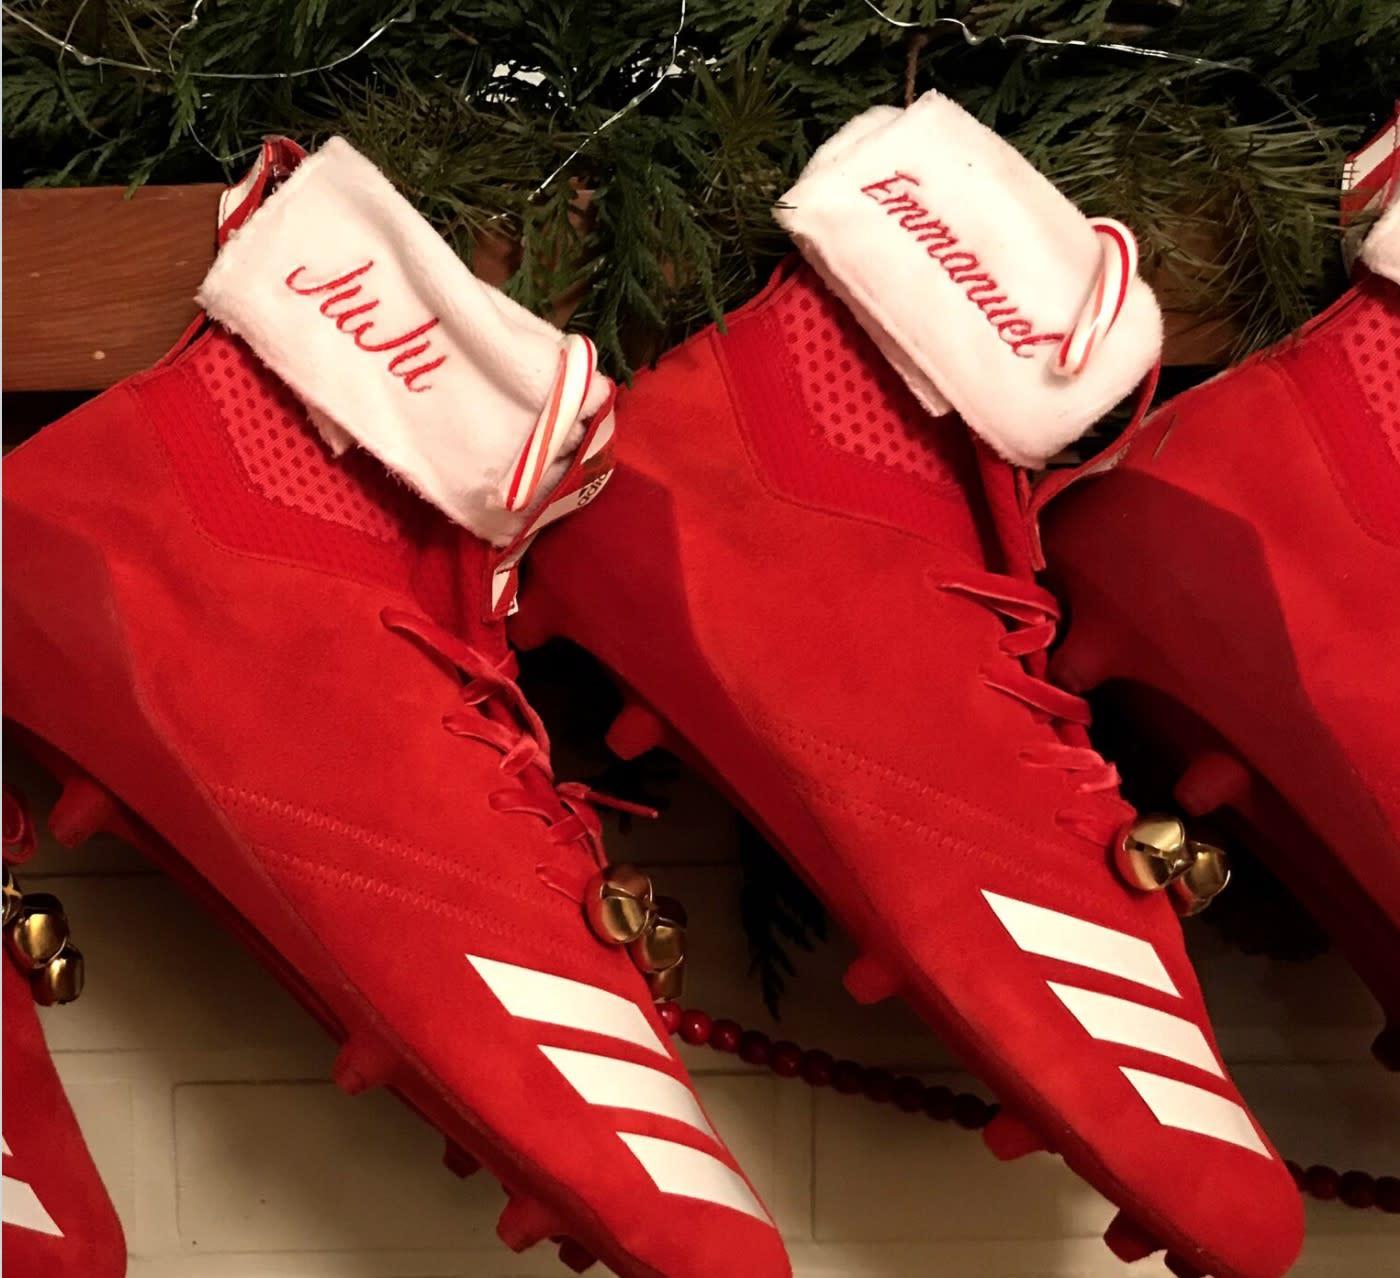 Adidas Football Christmas Stocking Cleats (2)